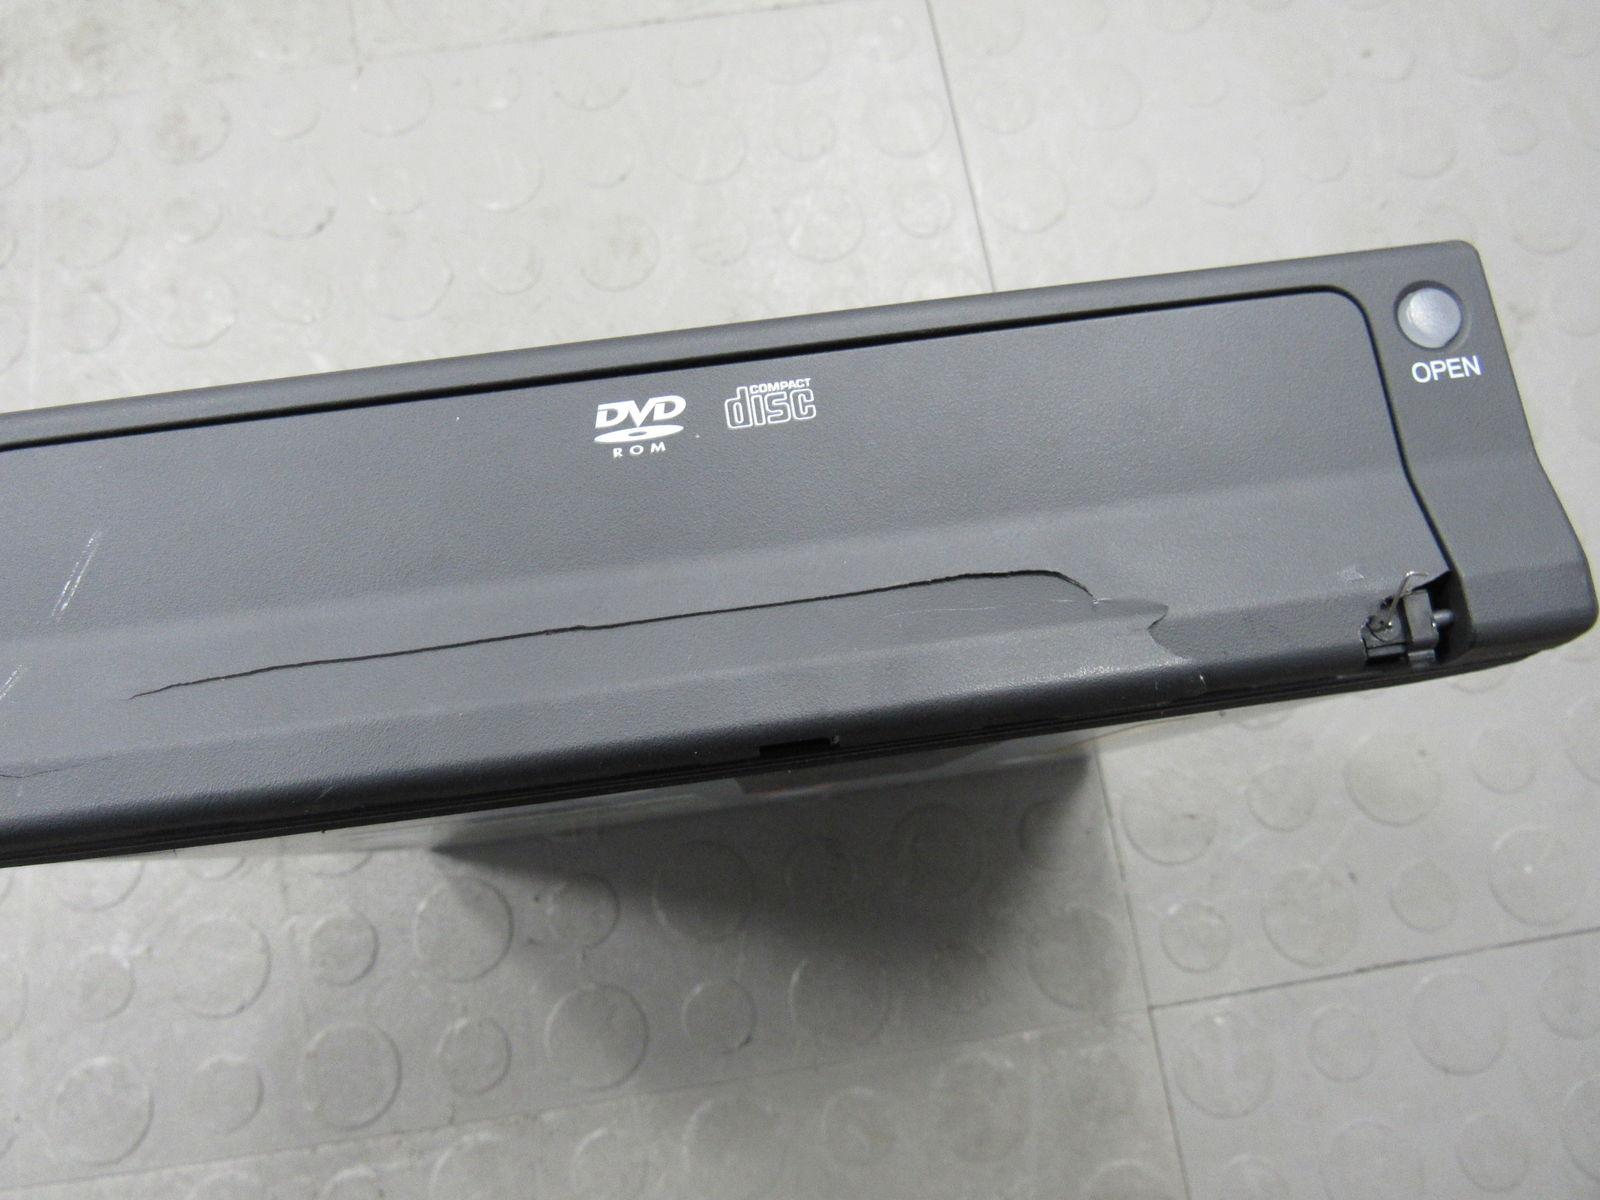 05 Acura Rl 2005 Tl Vsa Light On Gps Navi Navigation Dvd Rom Unit Disc Disk Drive 39540 Rh Importapart Com Problems